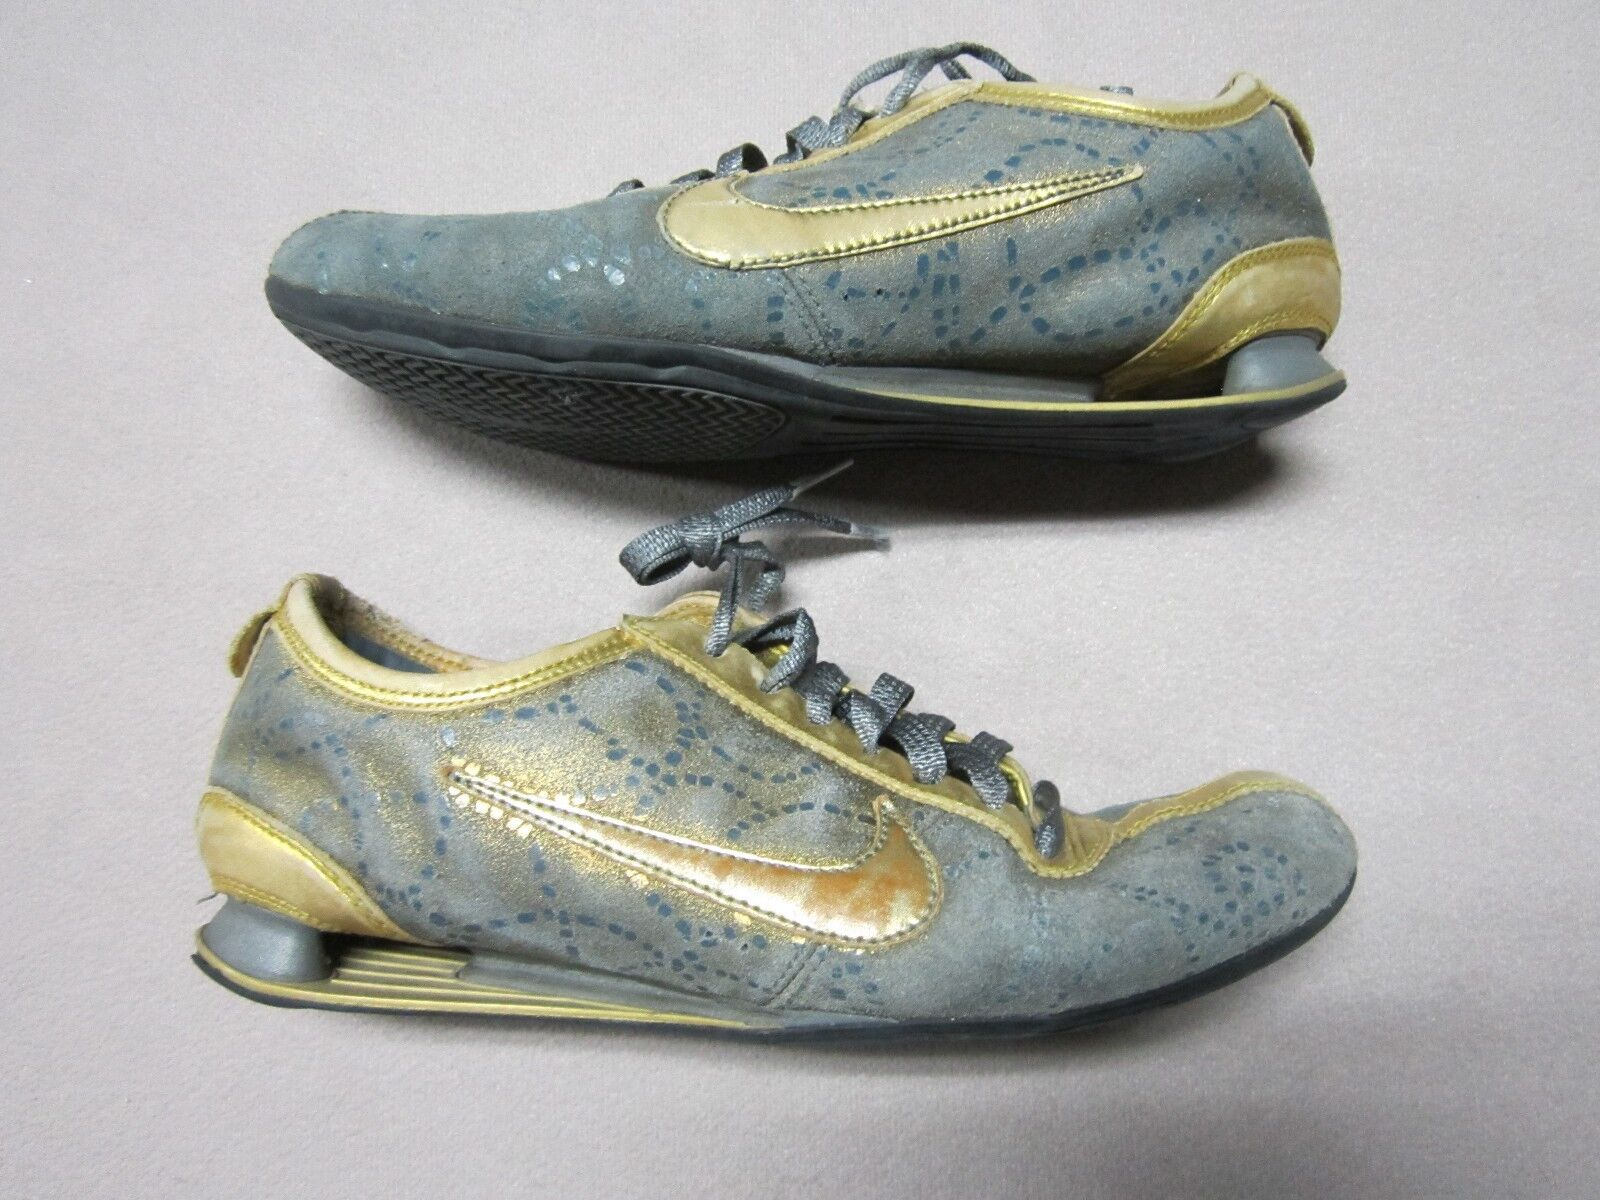 NIKE SHOX RIVALRY 7 PREMIUM Damenschuhe GOLD TRAINING Schuhe SIZE 7 RIVALRY #316327-071 RARE dbdae1